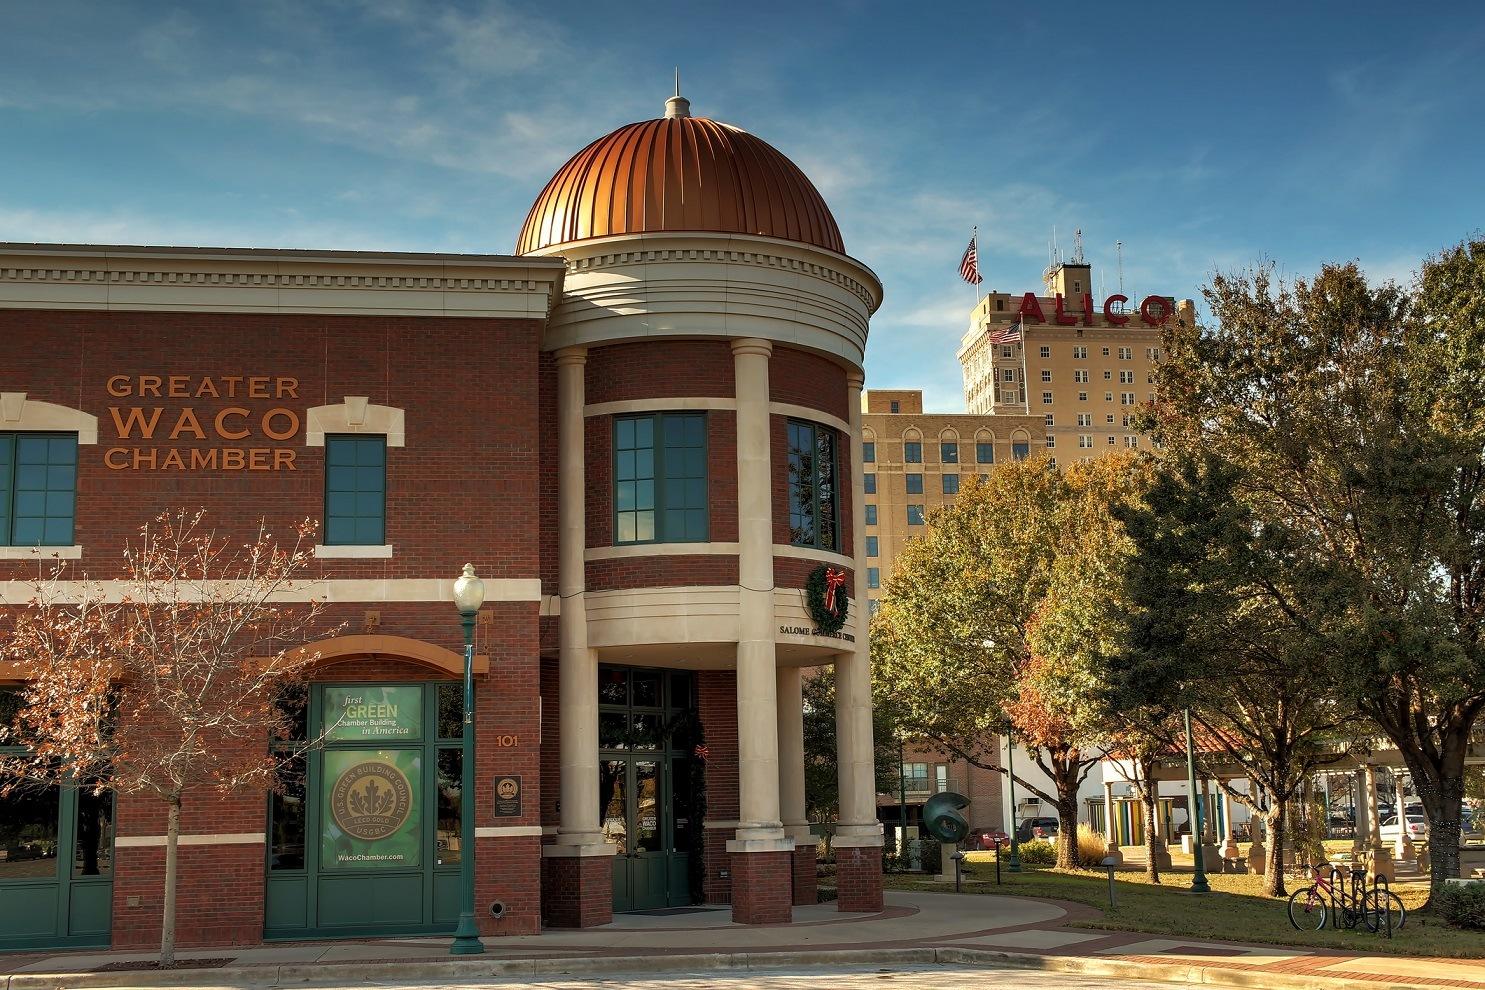 Waco Chamber of Commerce, Located in Waco Texas